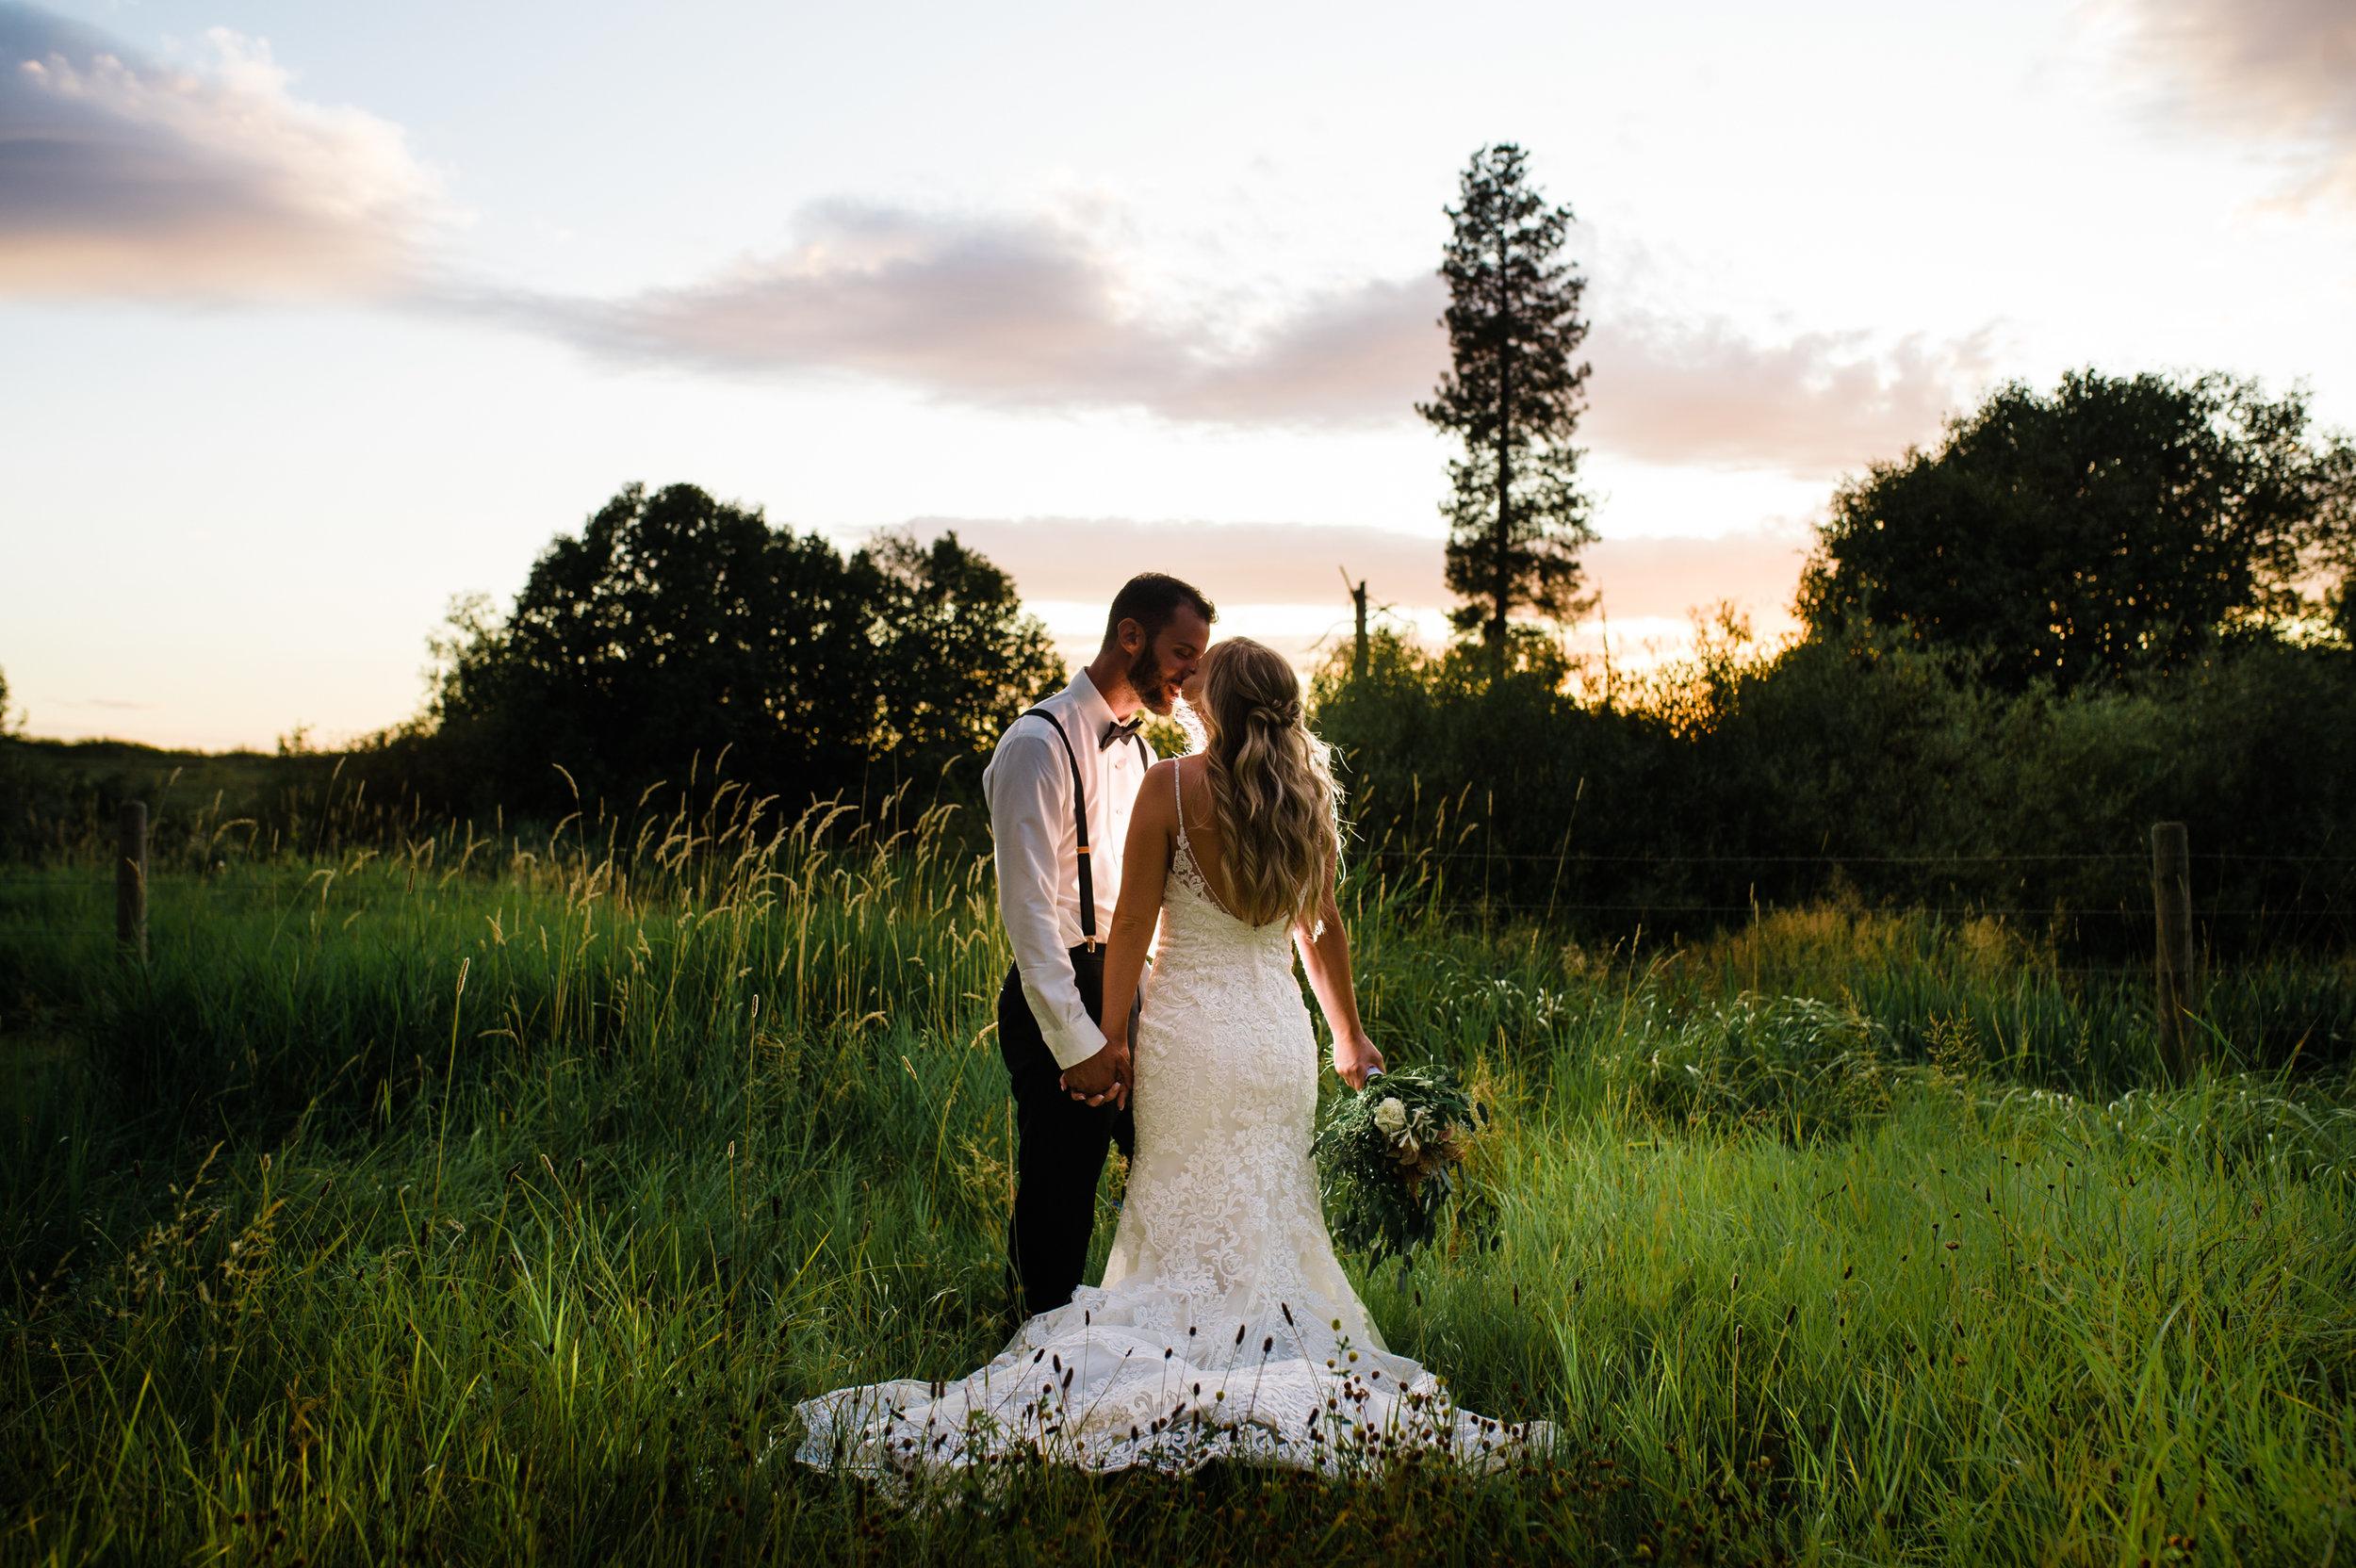 069Sky Ridge Ranch Wedding_Montana Wedding Photographer_Jessica & Brian_Honeybee Weddings_August 24, 2019-34.jpg